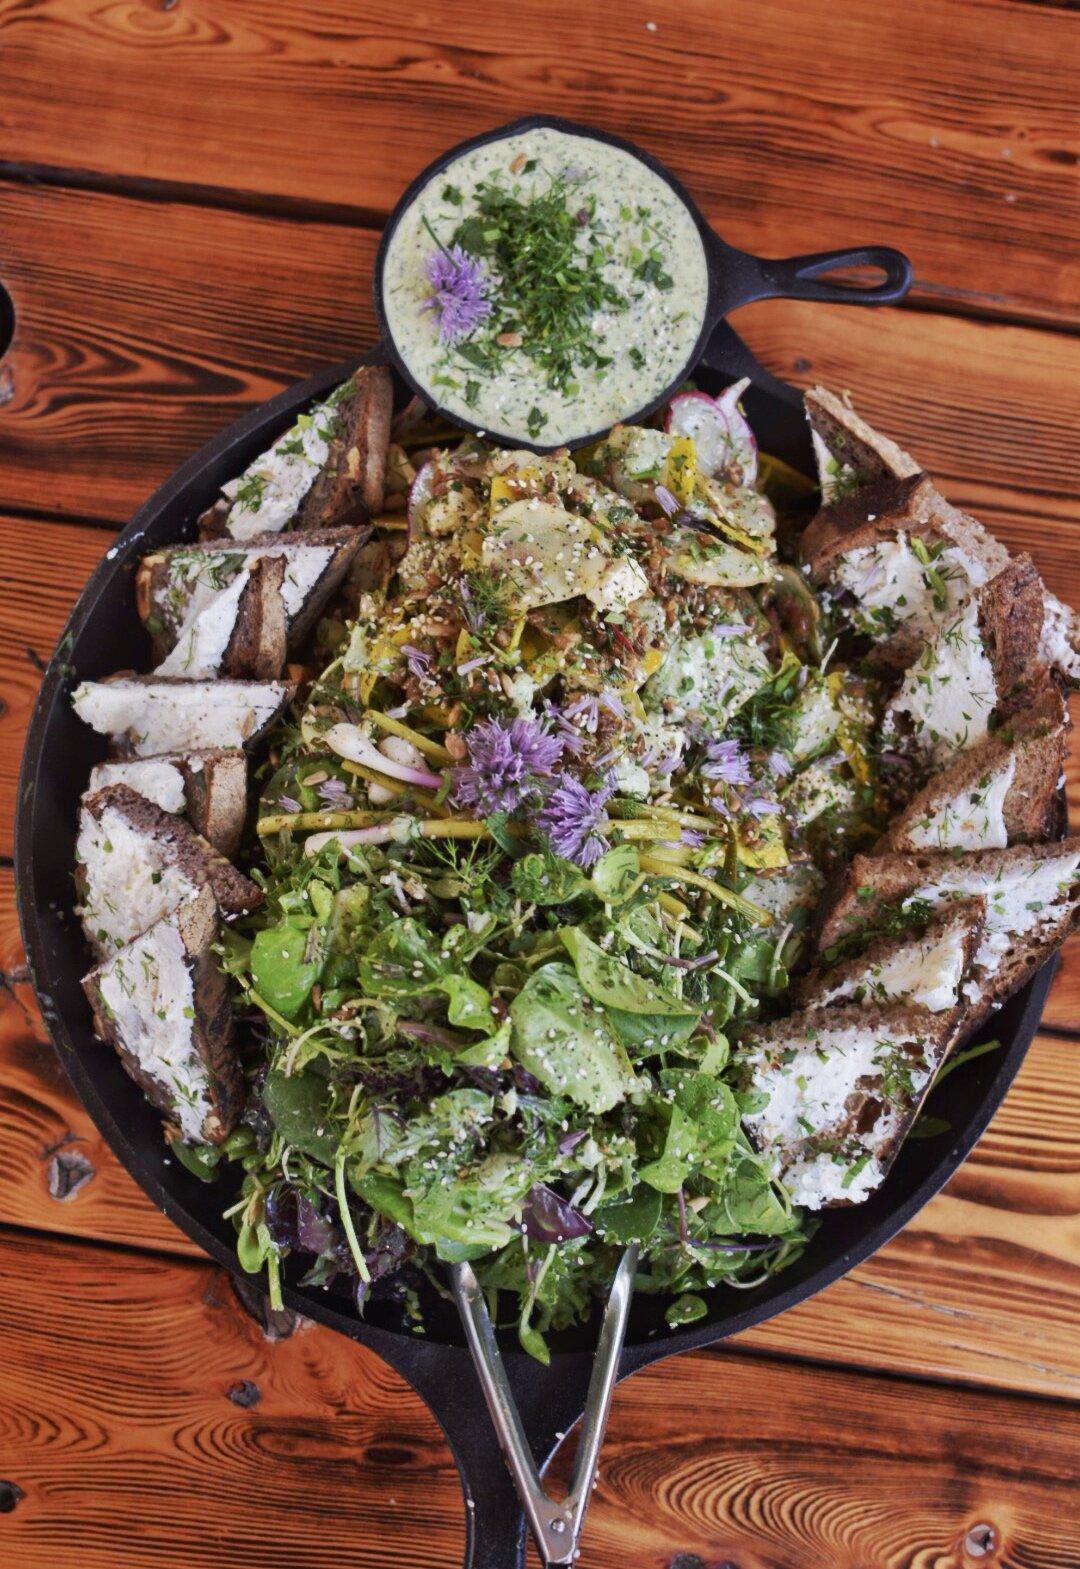 Summer Salad with Roasted Chicken.jpg